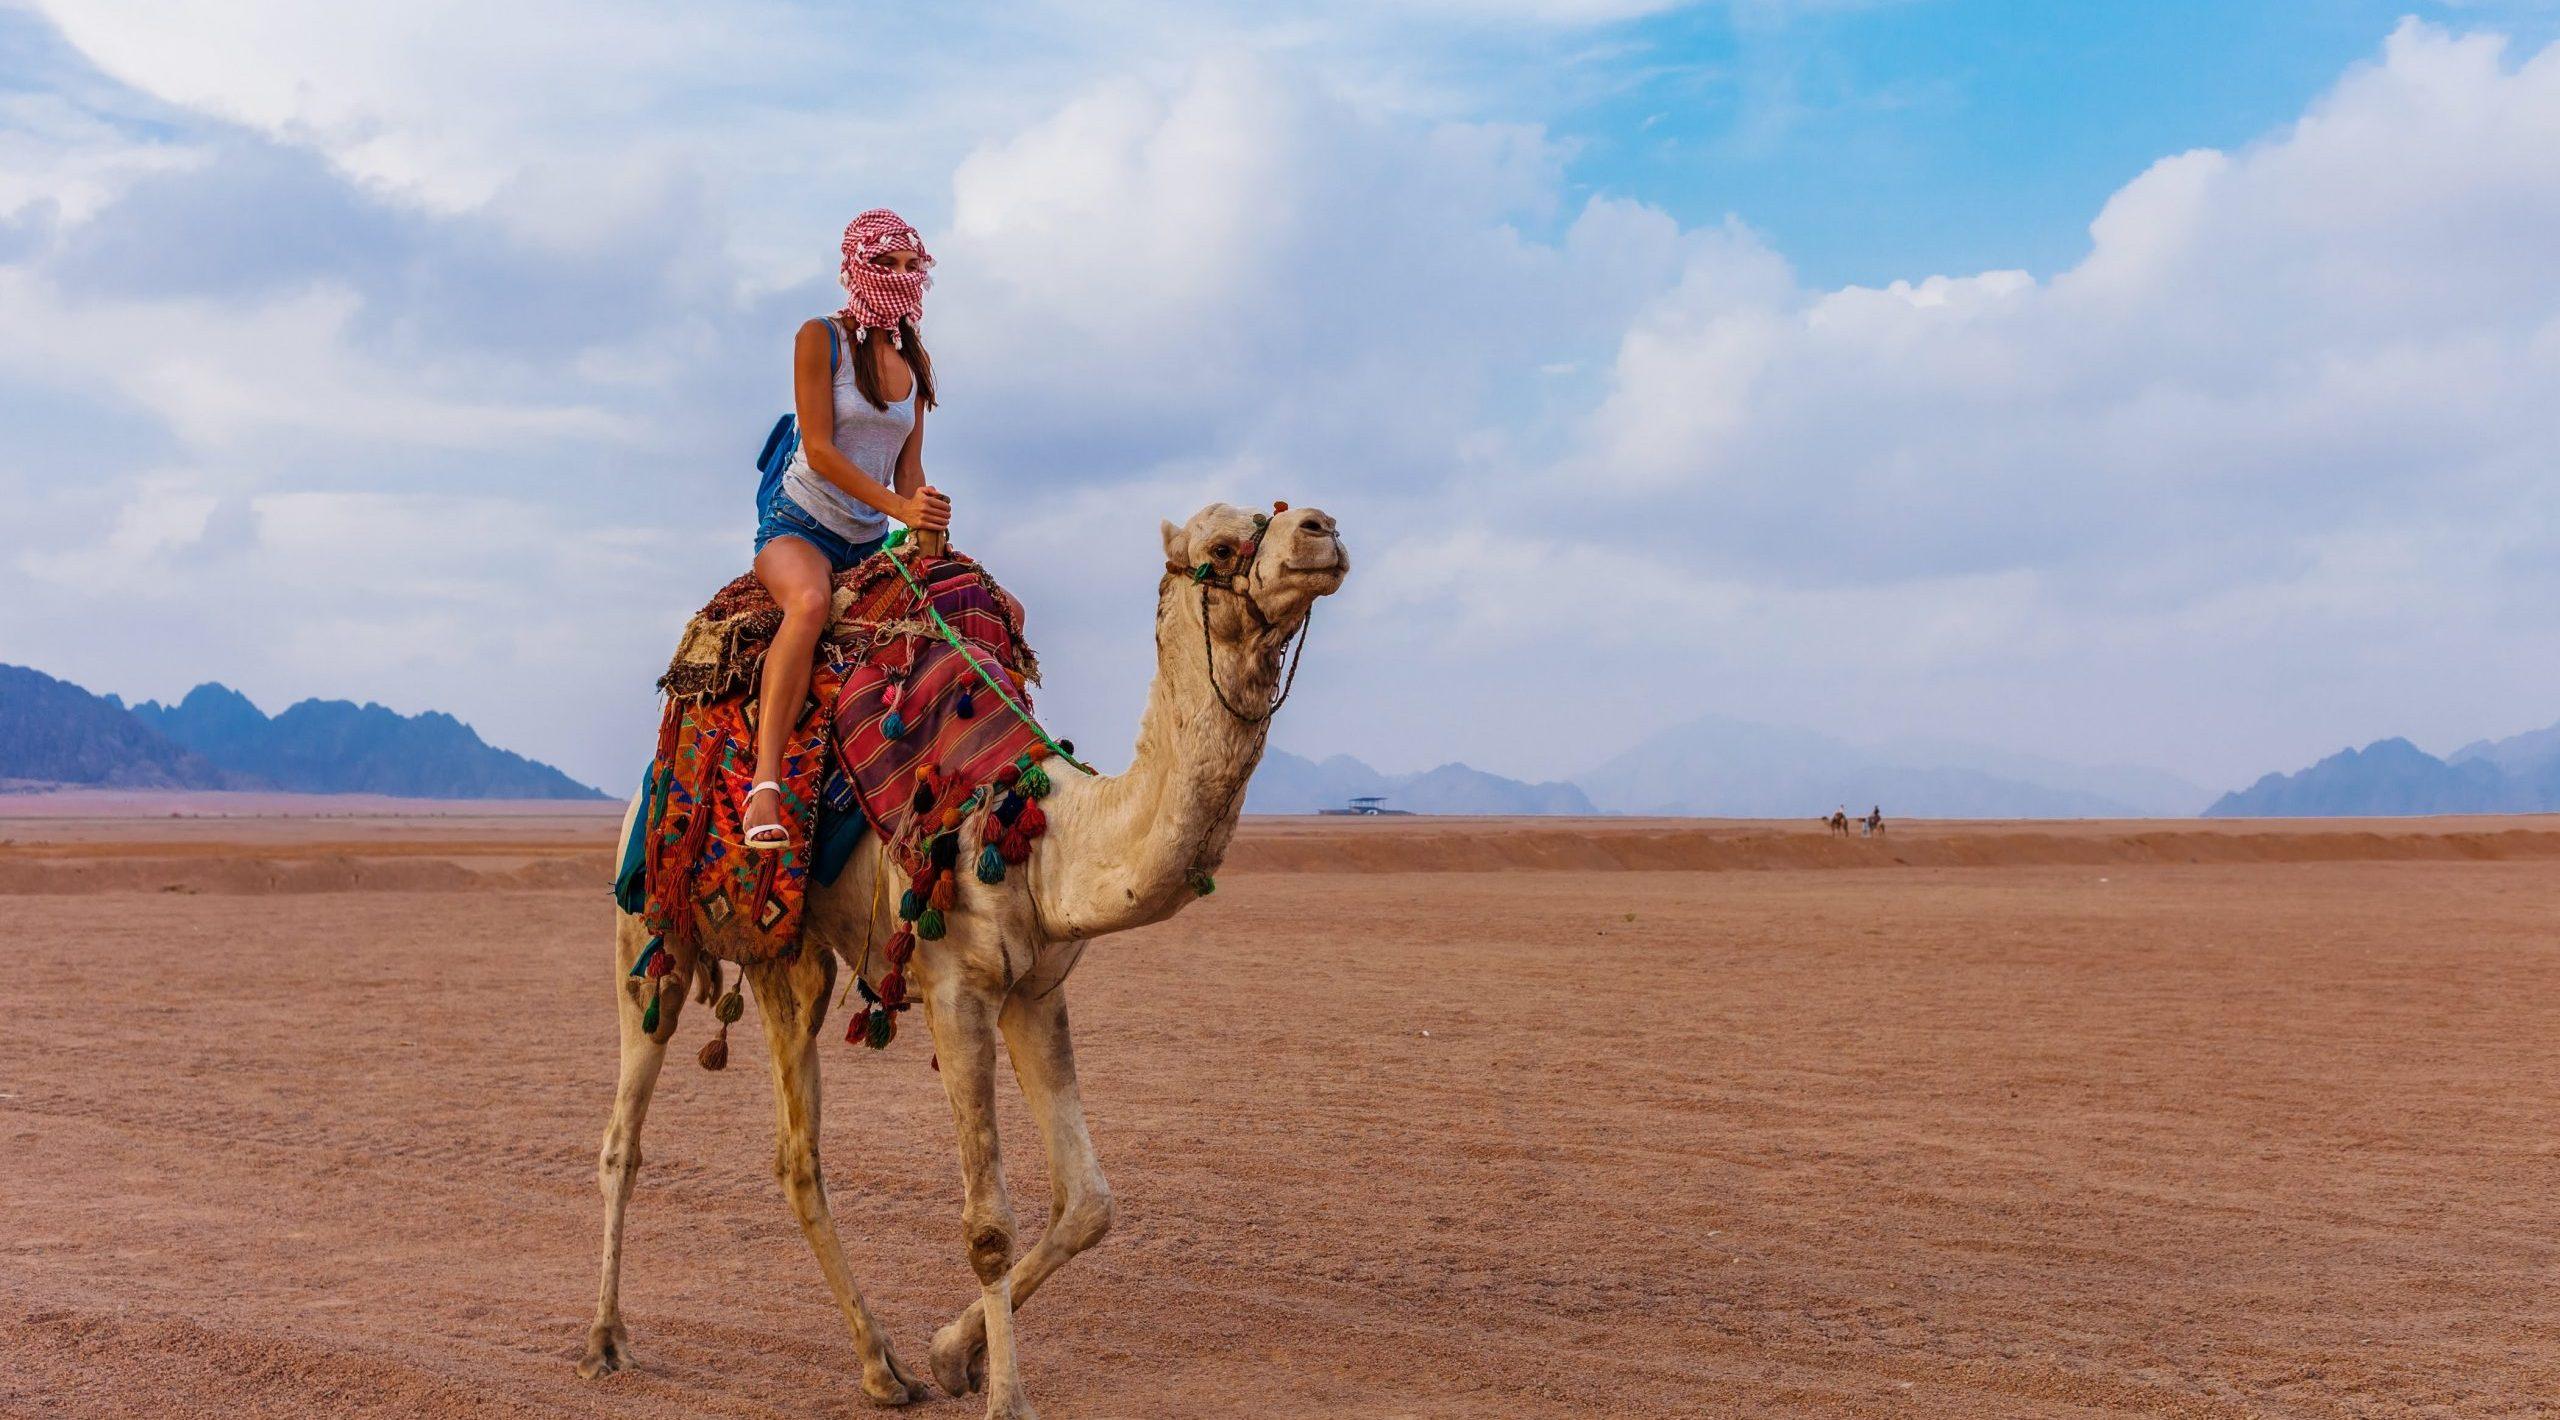 2 Day Sinai Camel Tour & Desert Camping Experience